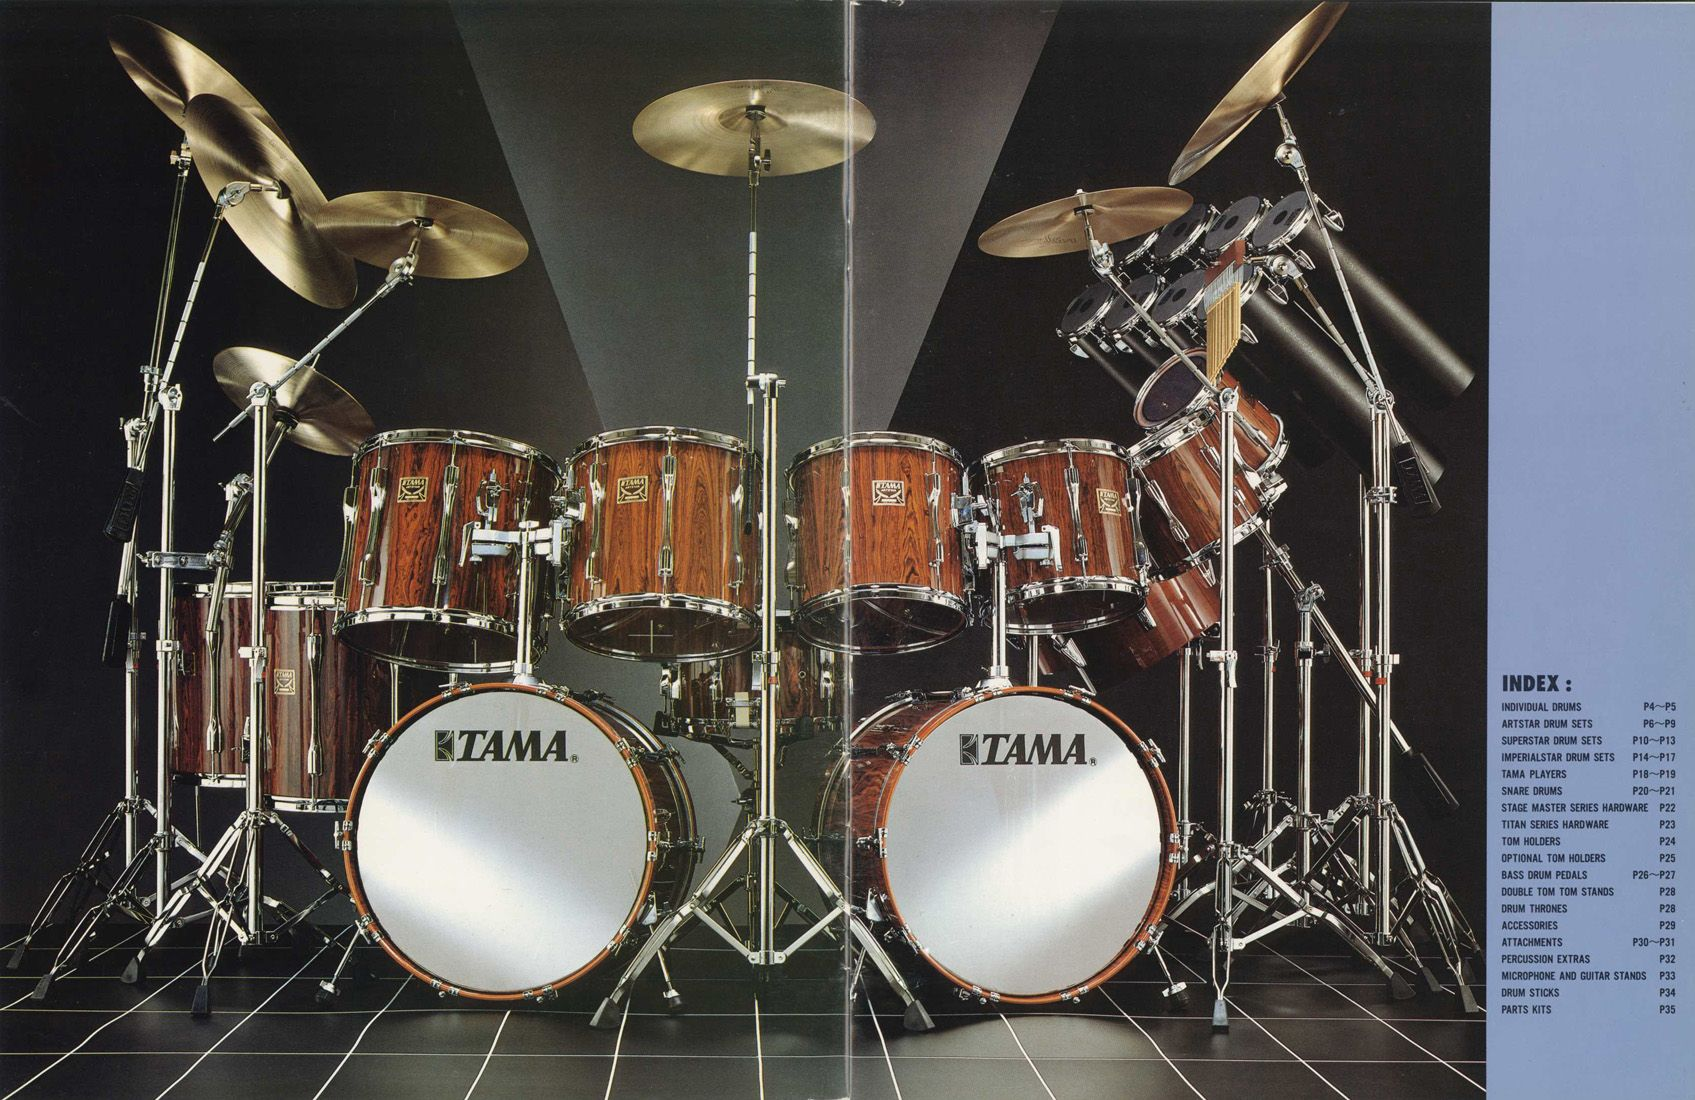 catalogue 1983 tama drums drum kits music drum lessons. Black Bedroom Furniture Sets. Home Design Ideas